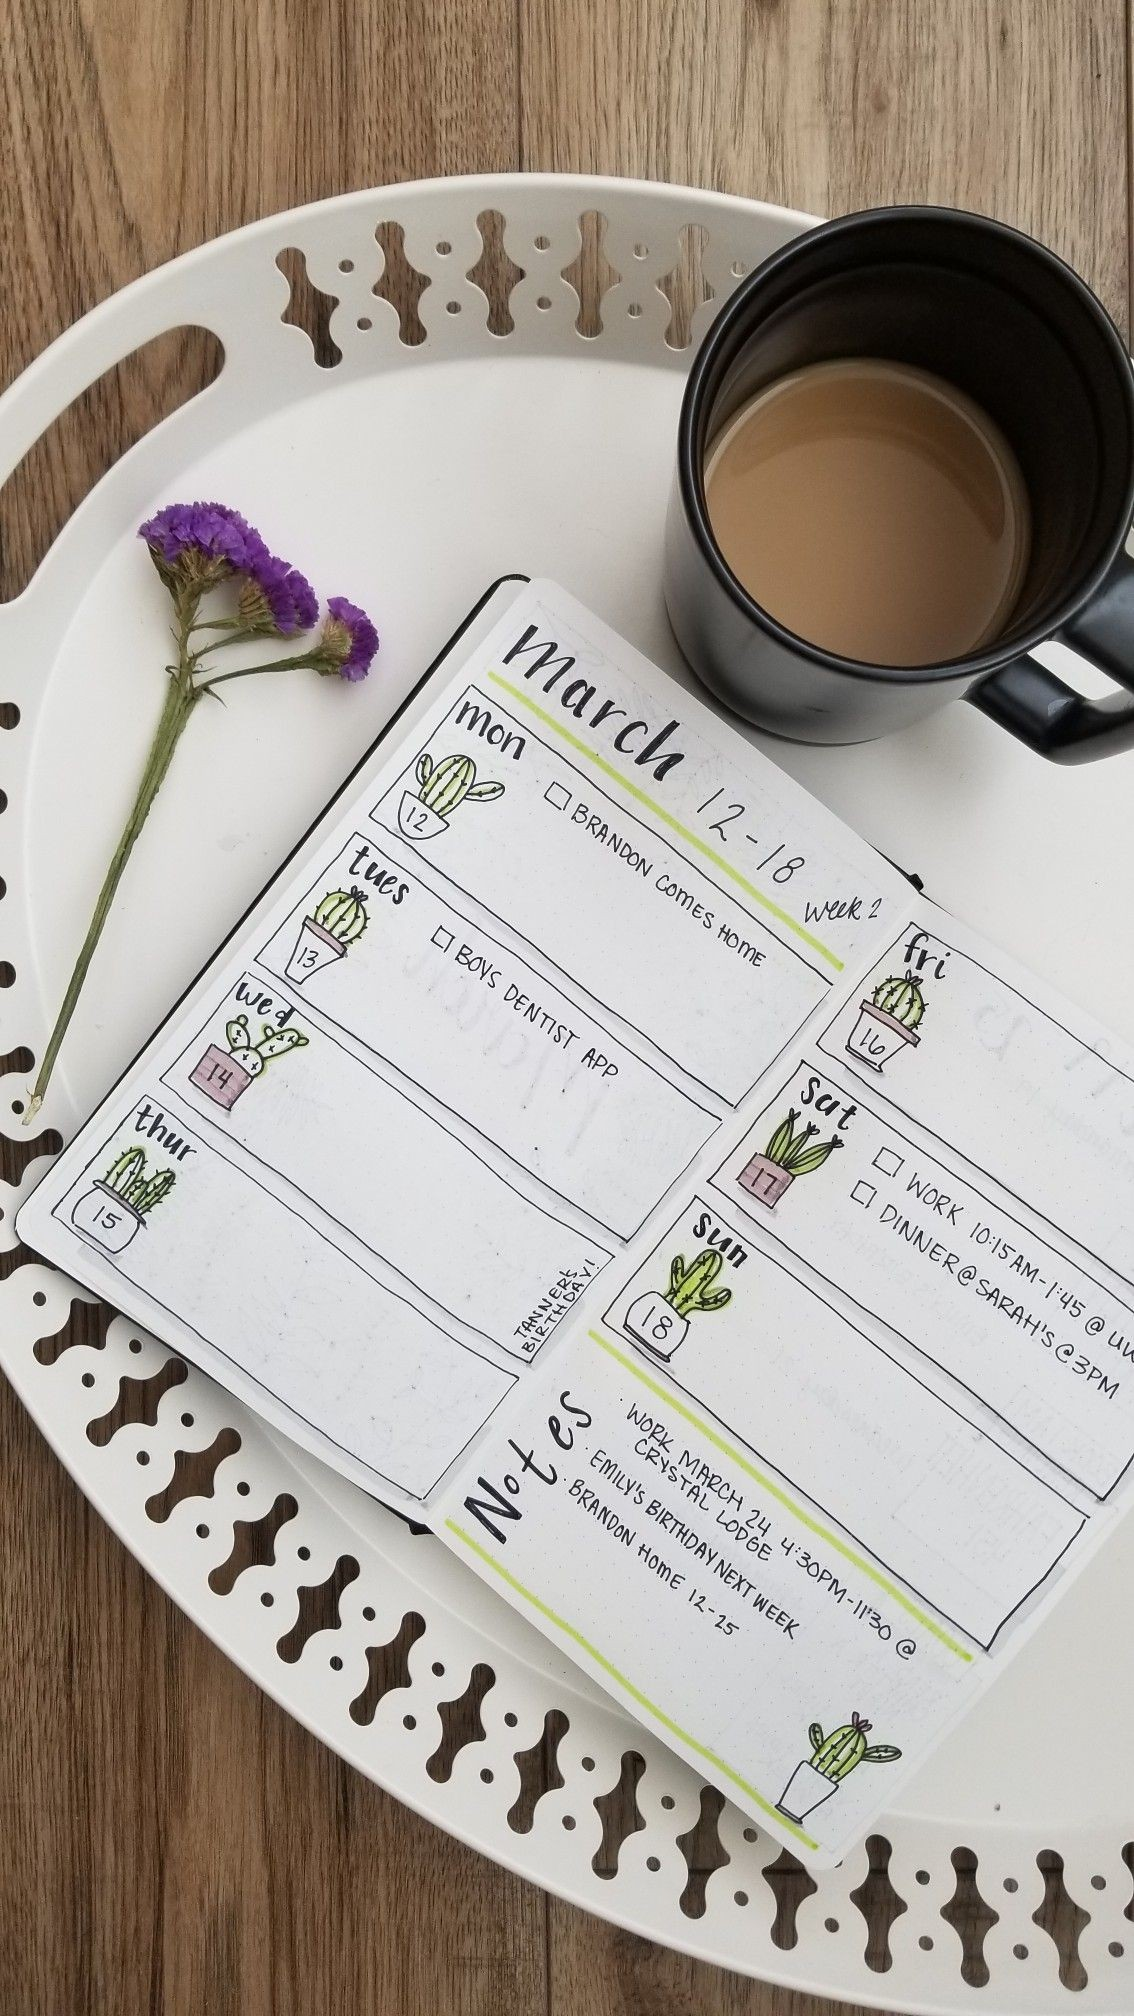 My March spread inspired by Amanda rachlee cactus weeklyspread march bujo bulletjournal planner